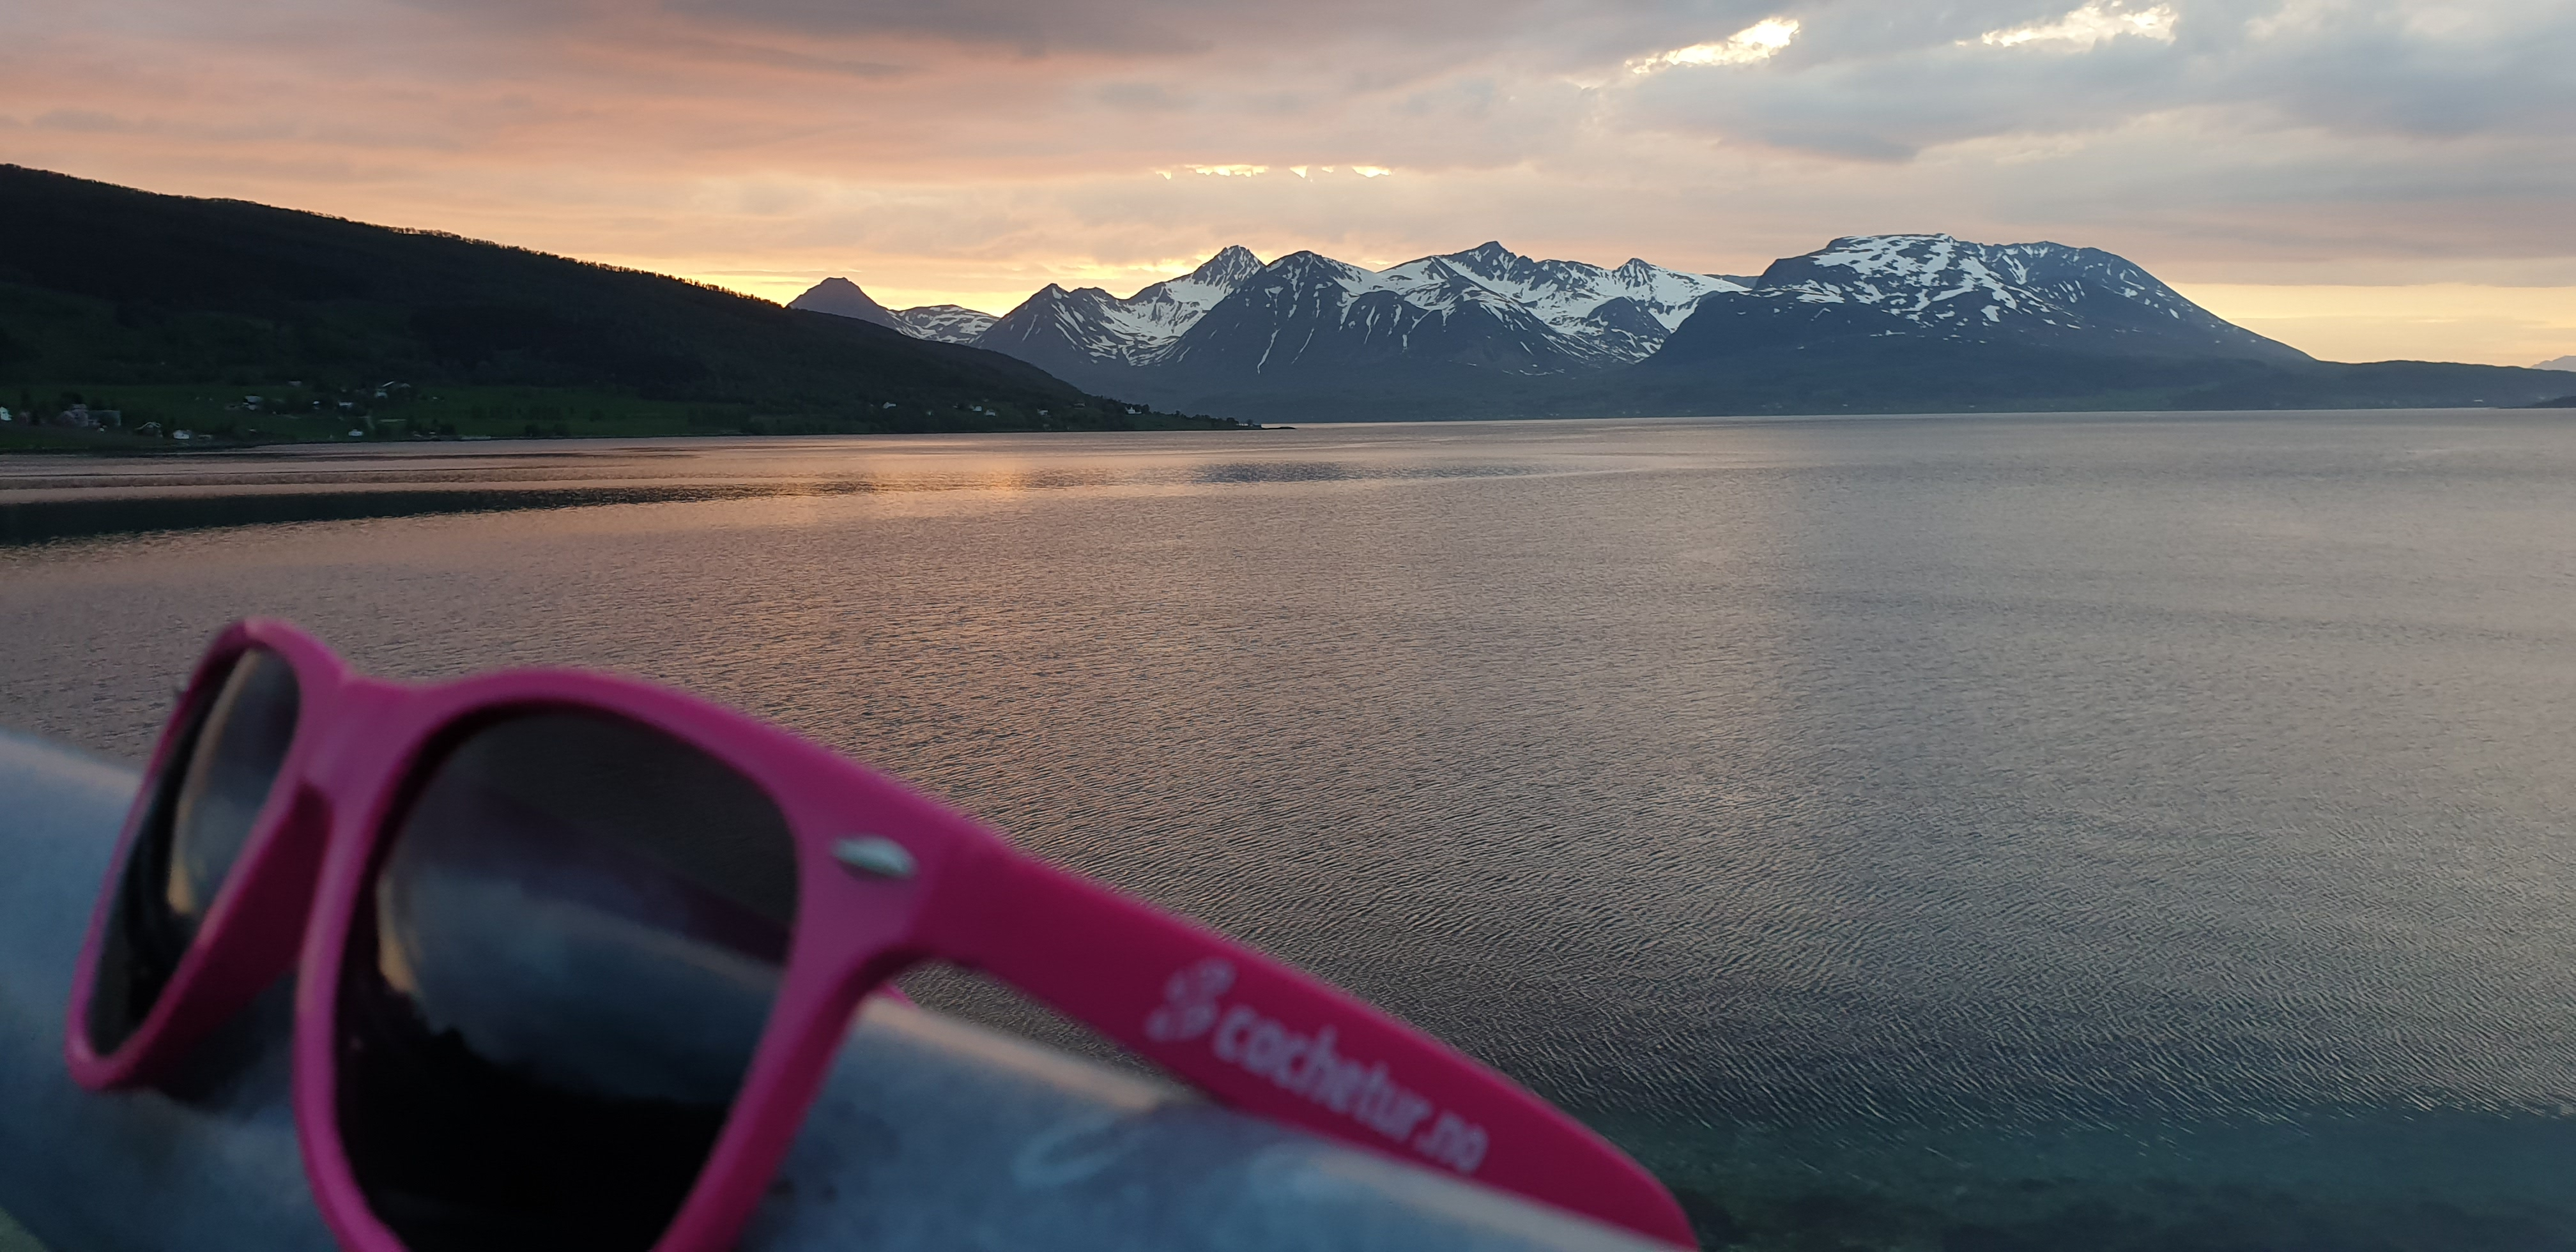 cachetur.no sunglasses and a nice view